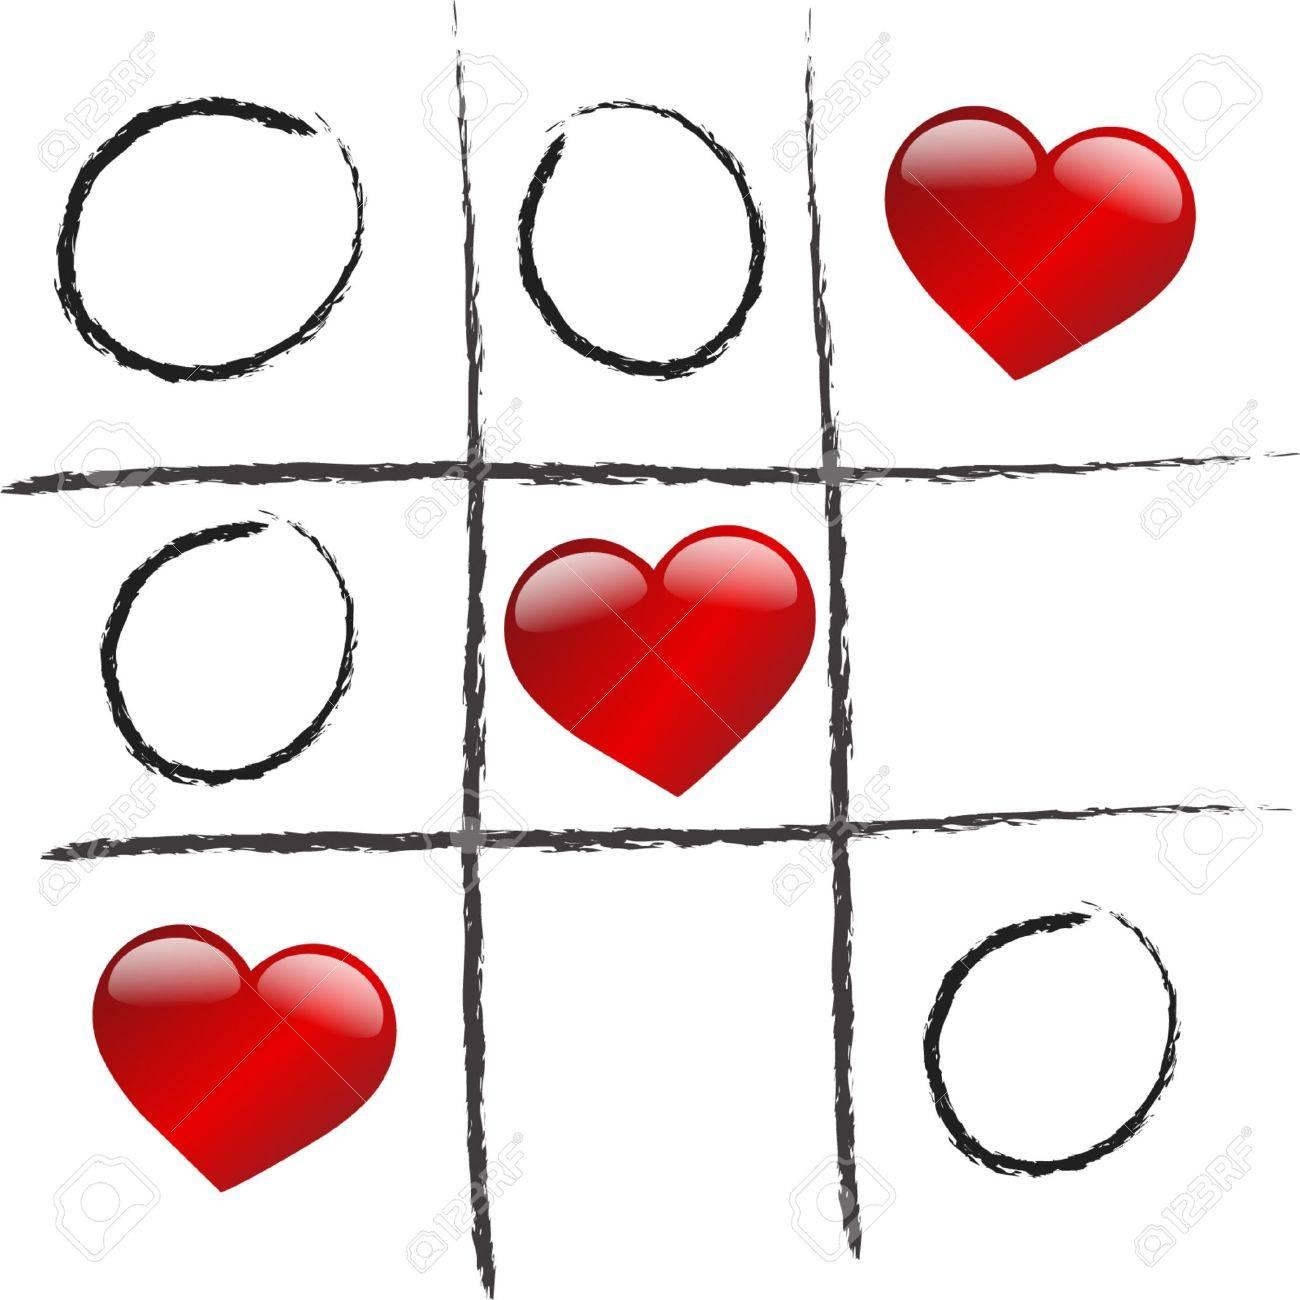 love is winning game Stock Vector - 5881202